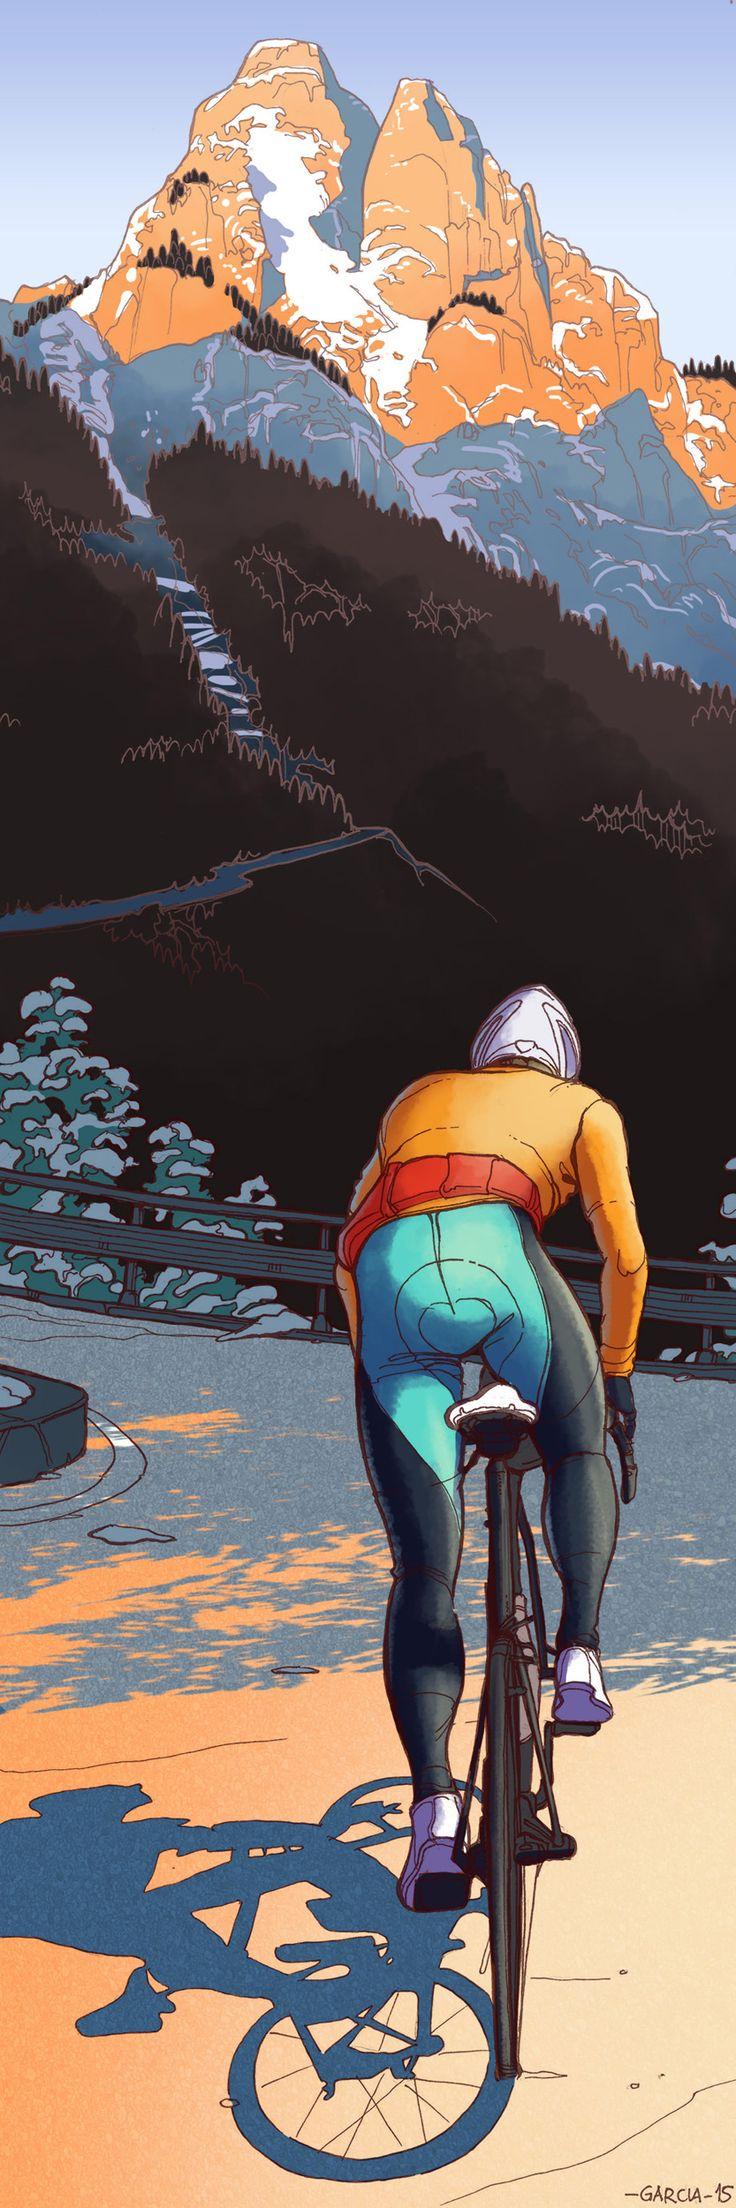 Art by Daniel Garcia- Cycling. (illustration, szosa, calendar, cycling, cyclist, bike, road, mountain)